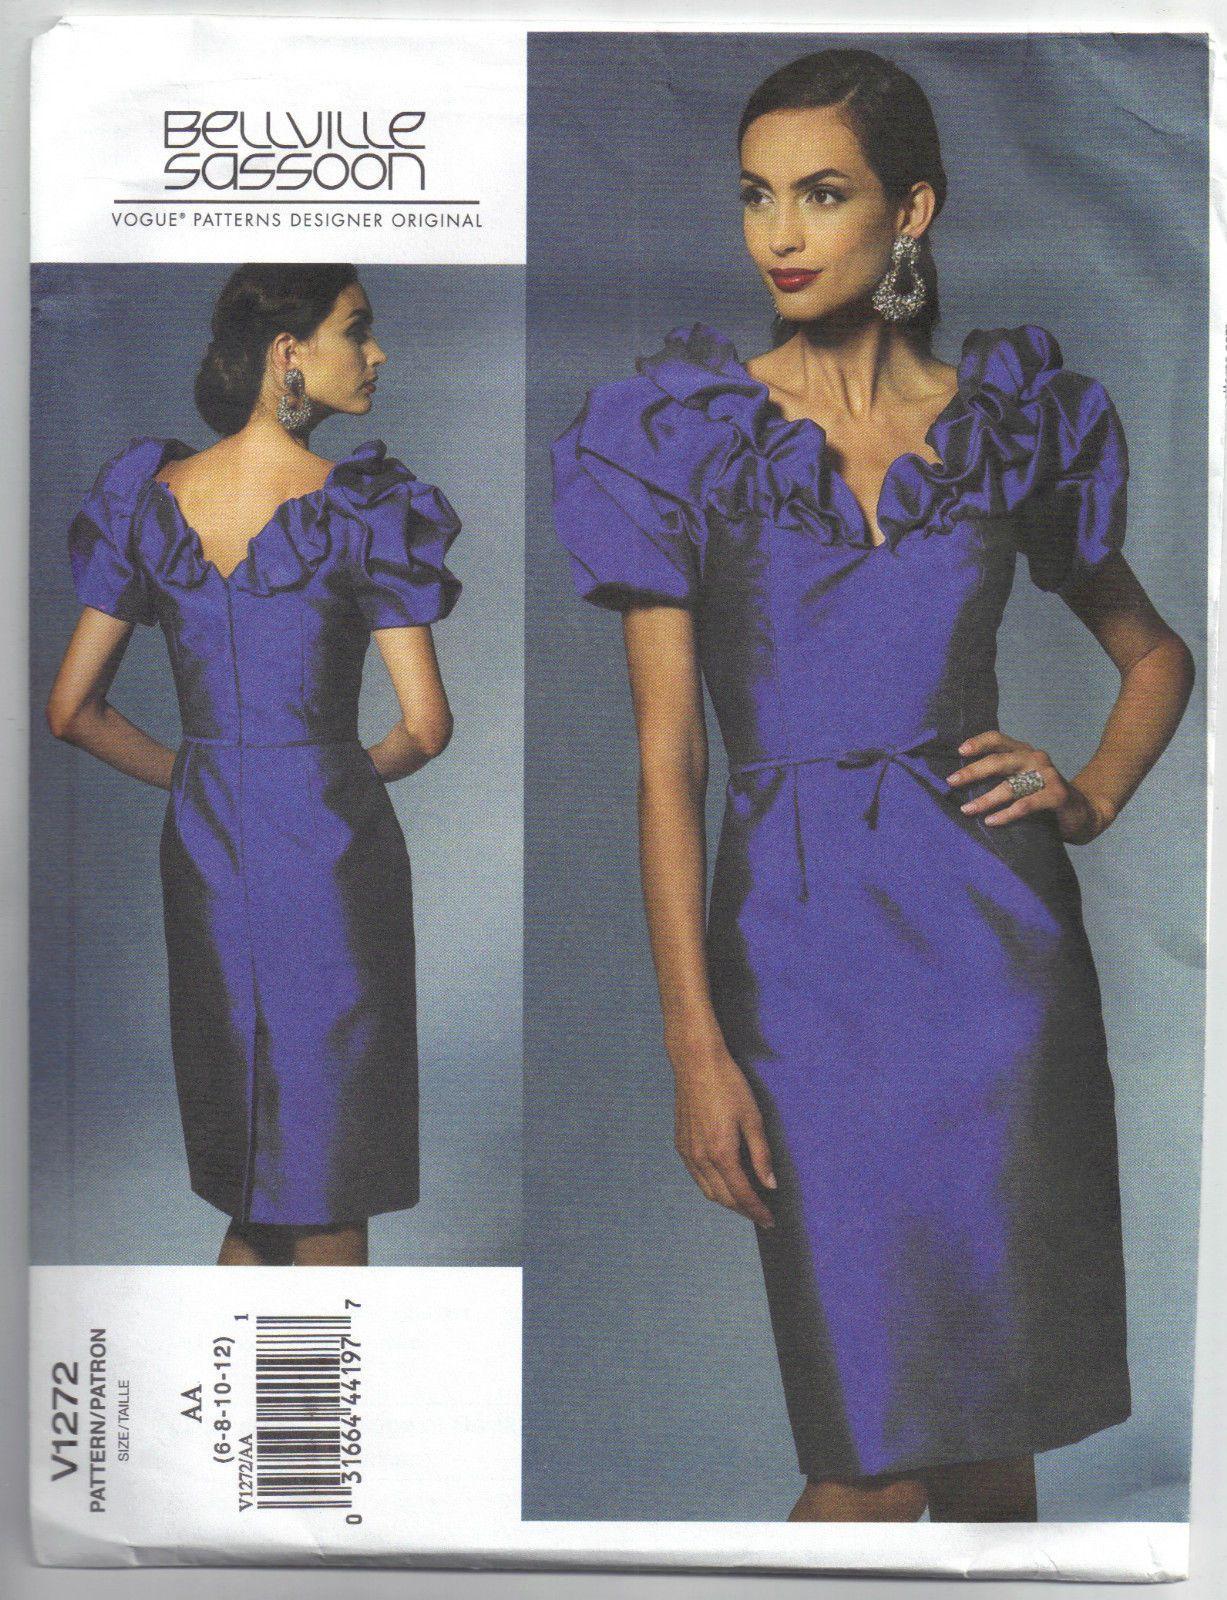 Tea length wedding dress patterns to sew  V Bellville Sassoon Evening Bridal Formal Dress     Vogue